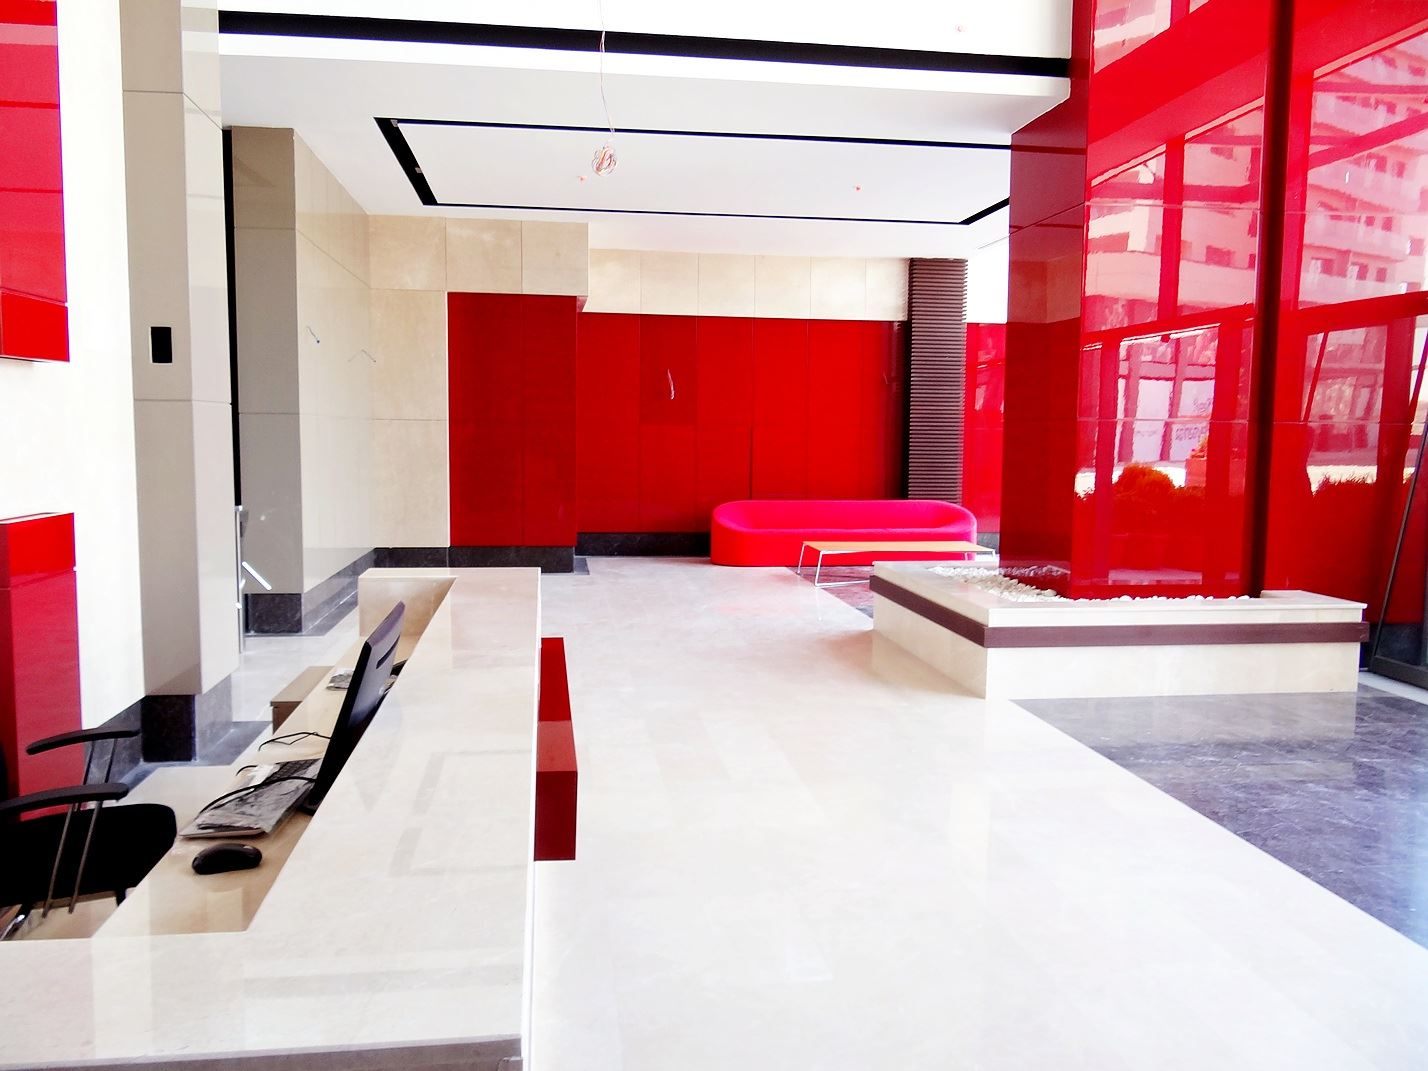 Vestgate-1+1-Satılık-Acil-Eskişehiryolu manzara-Recidence-Ofis